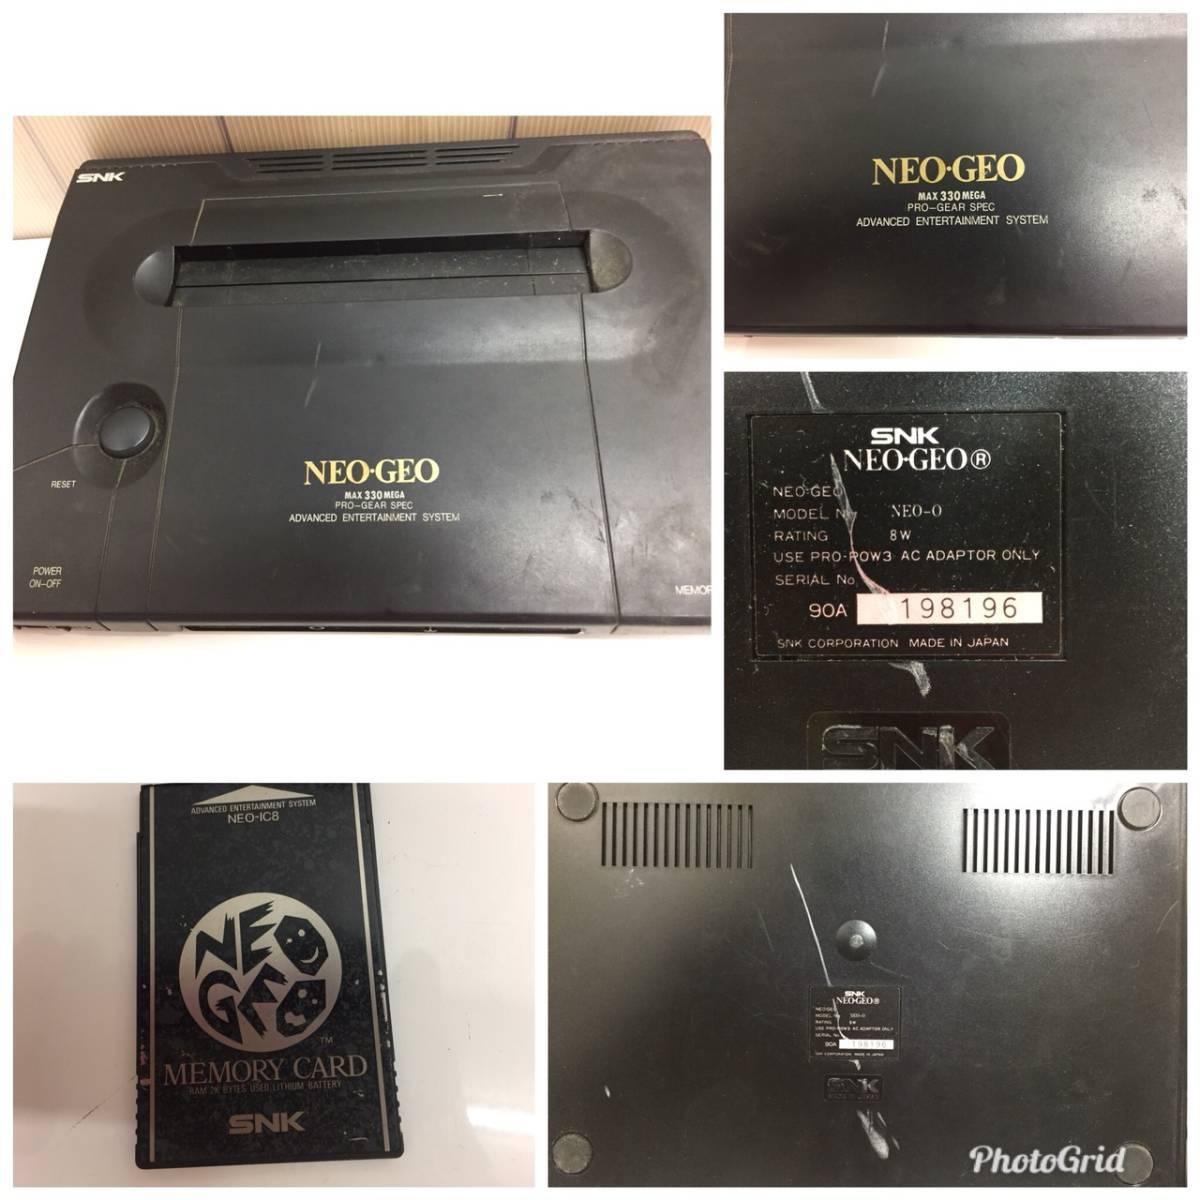 (25)NEO-GEO MAX330 MEGA 本体 コントローラ付_画像2